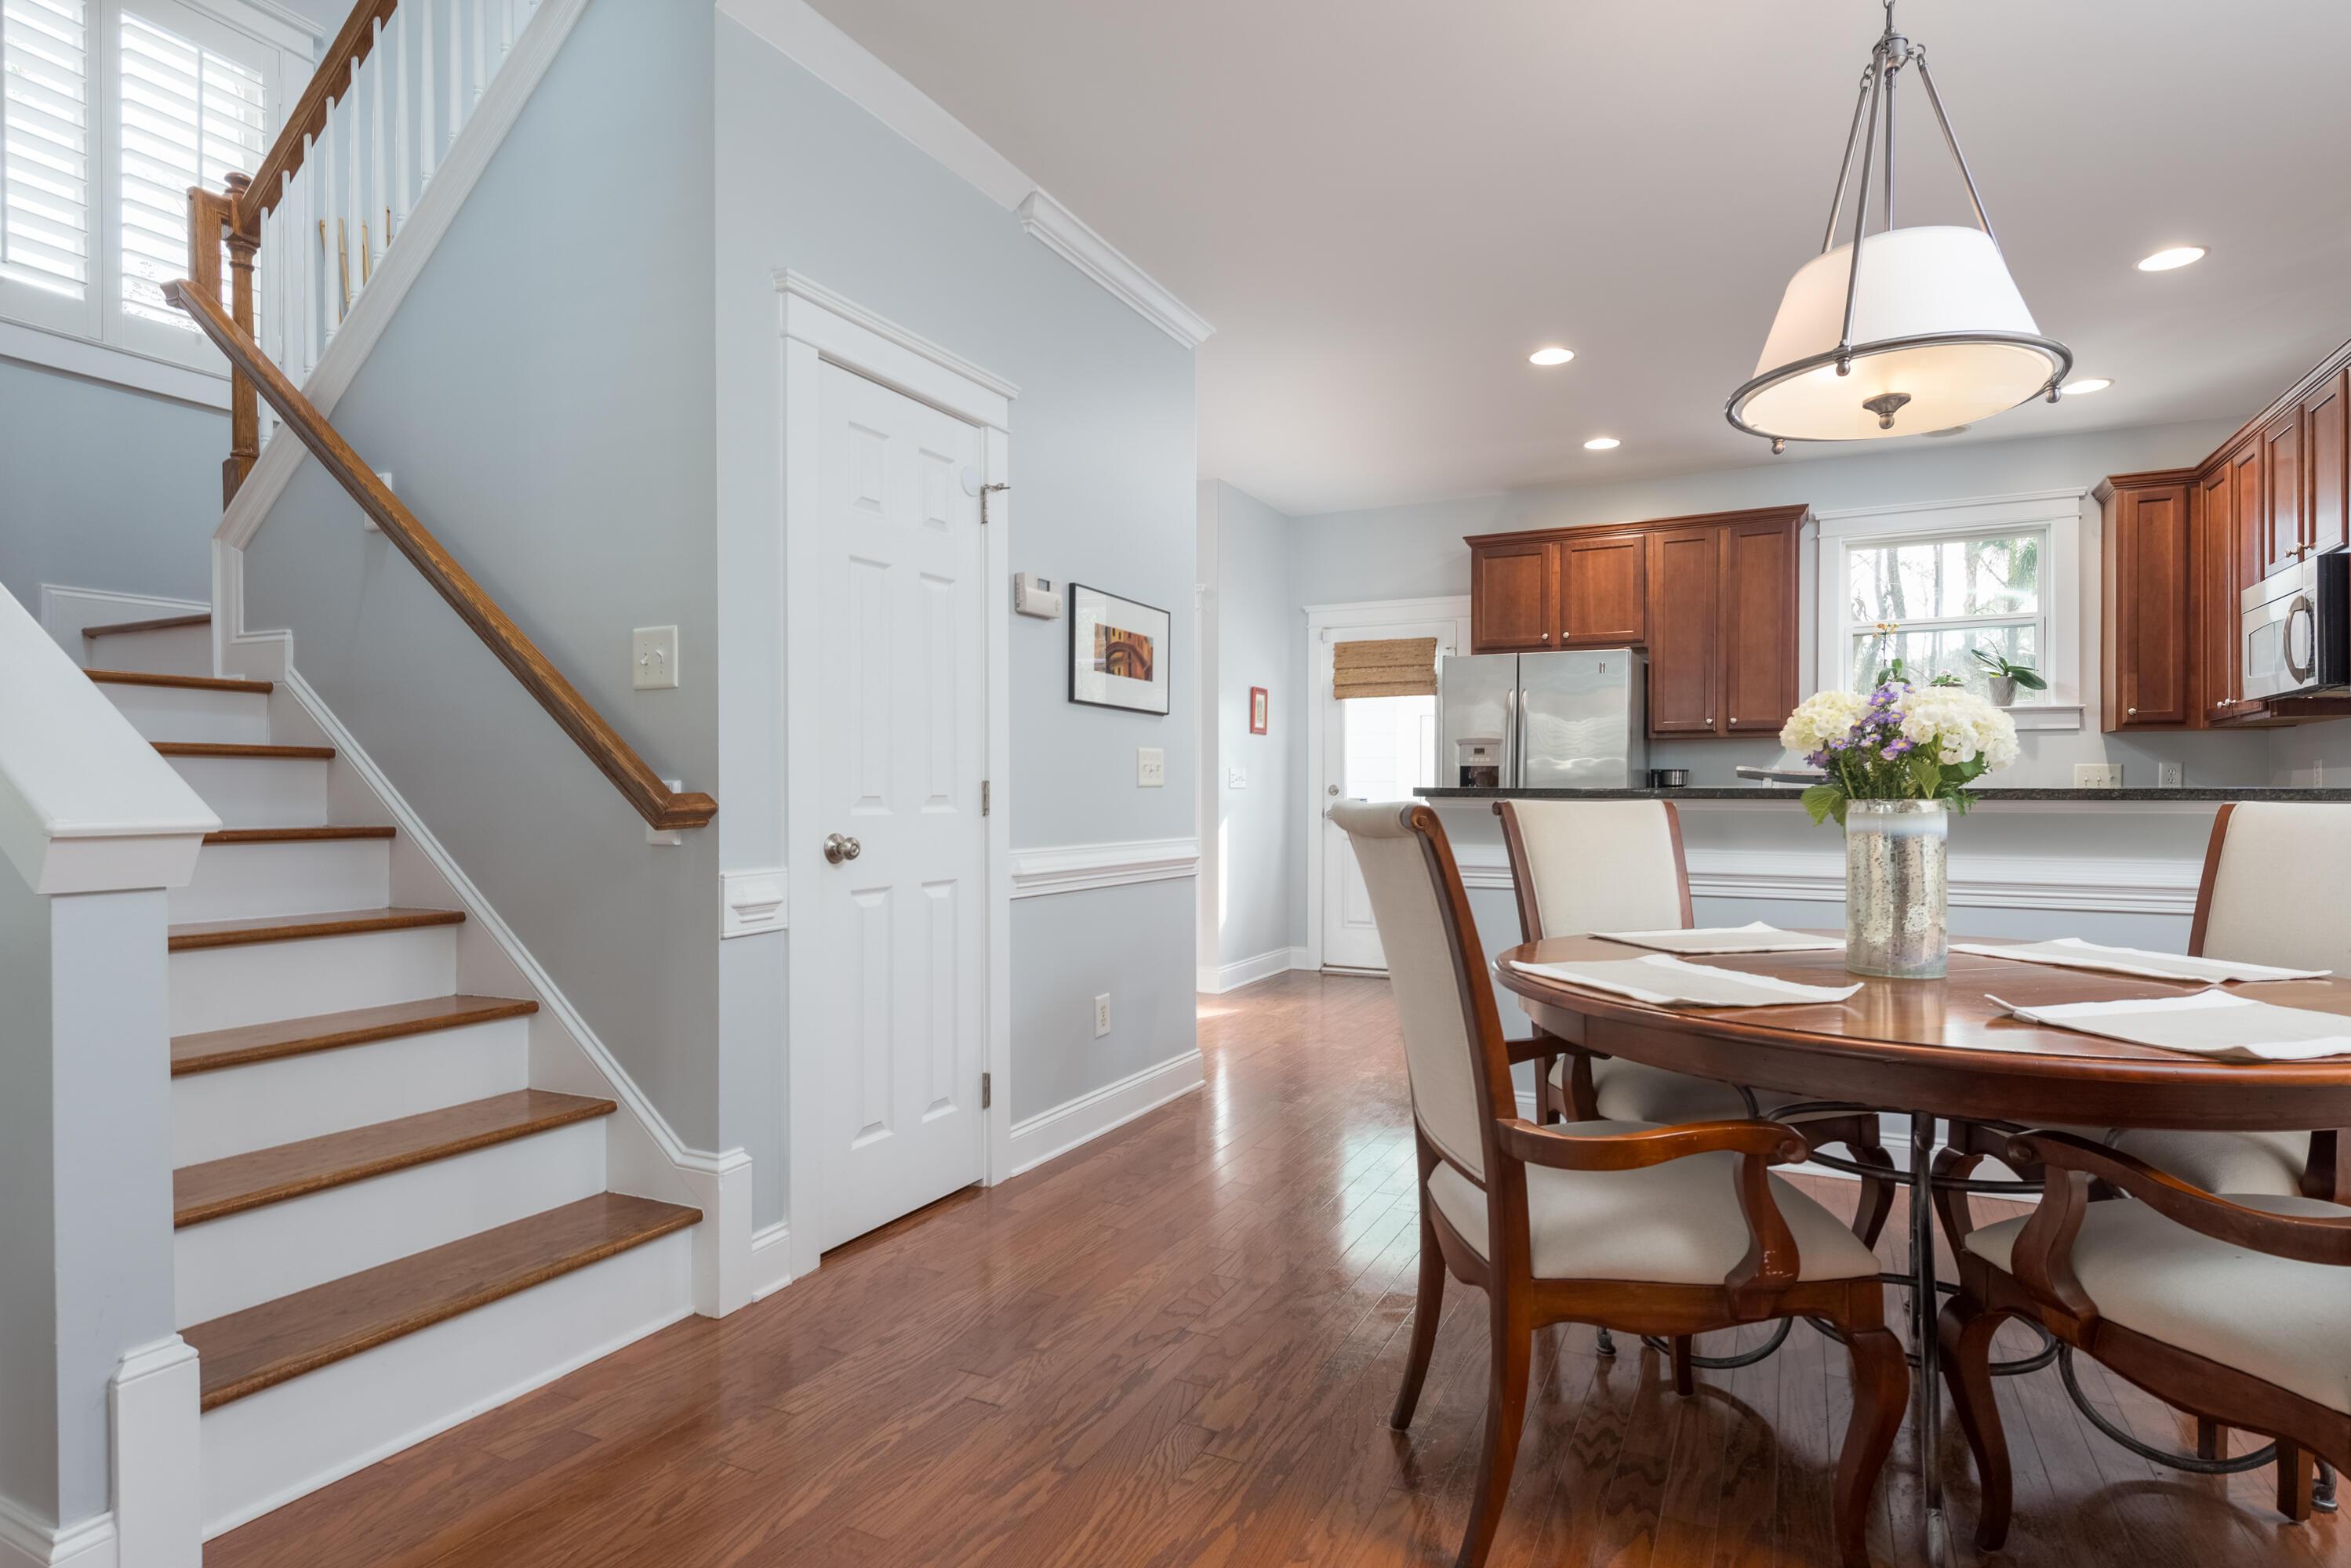 Carol Oaks Homes For Sale - 2813 Caitlins, Mount Pleasant, SC - 13